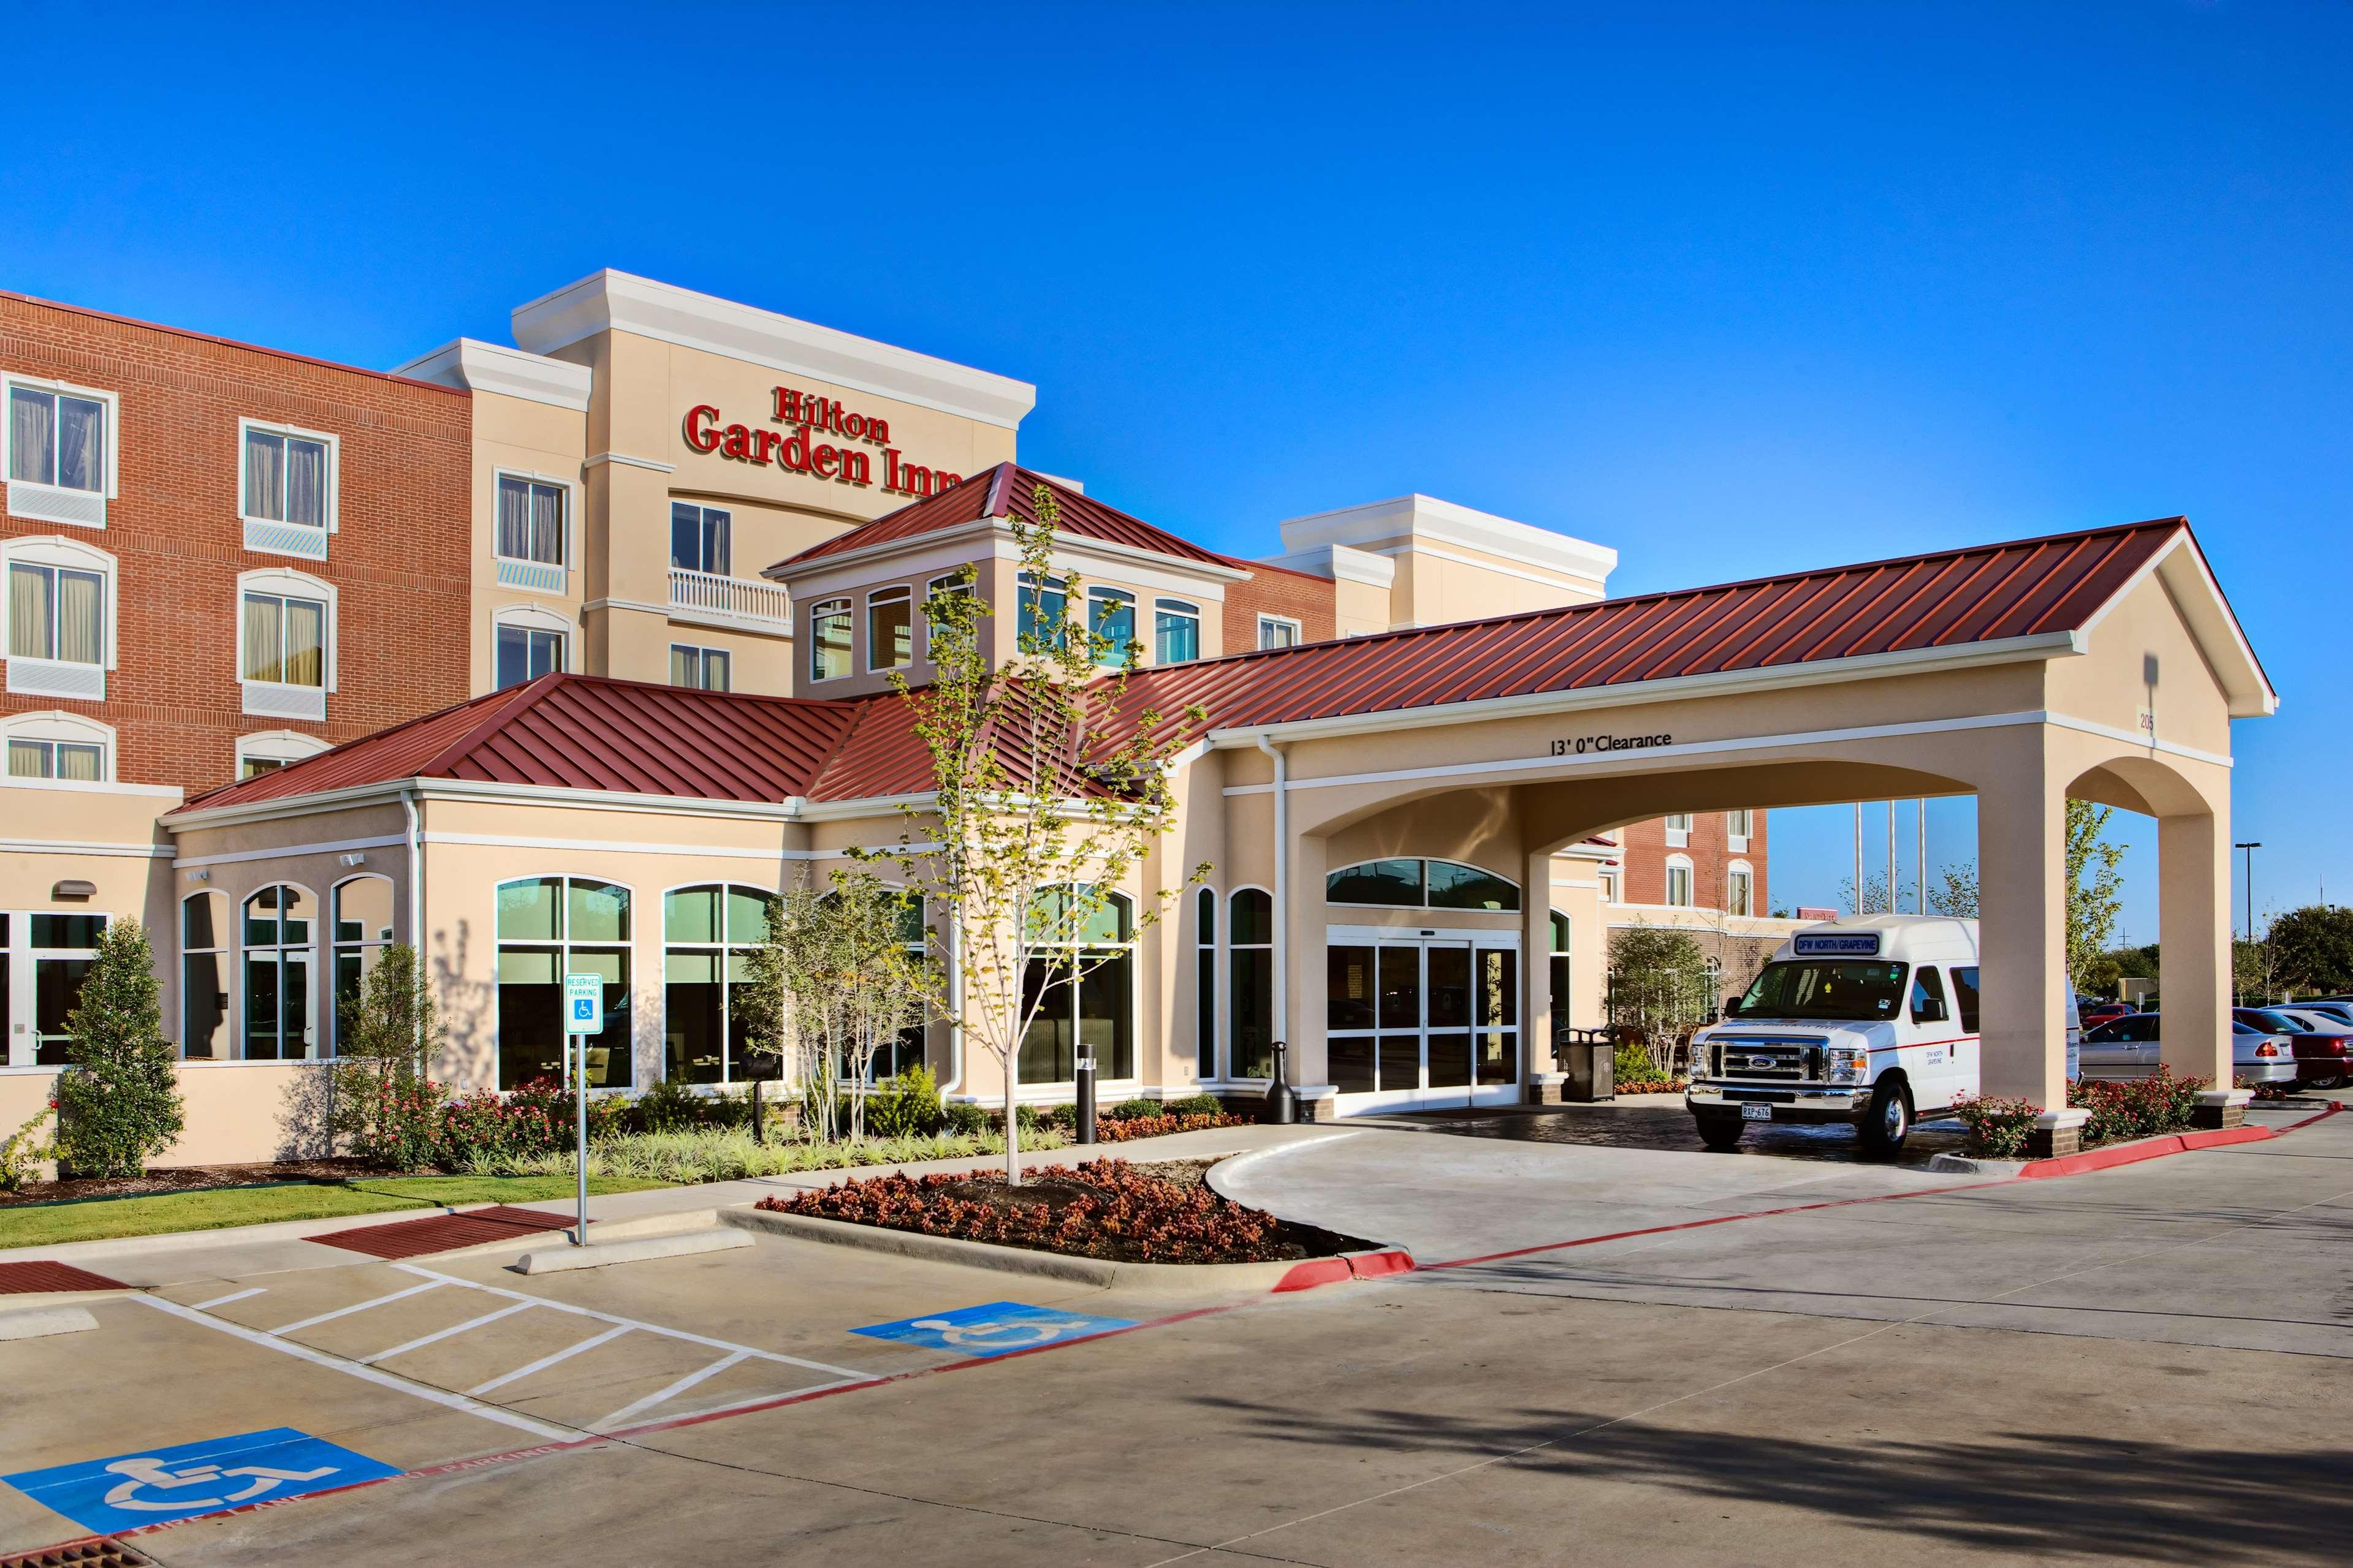 Hilton Garden Inn DFW North Grapevine image 0